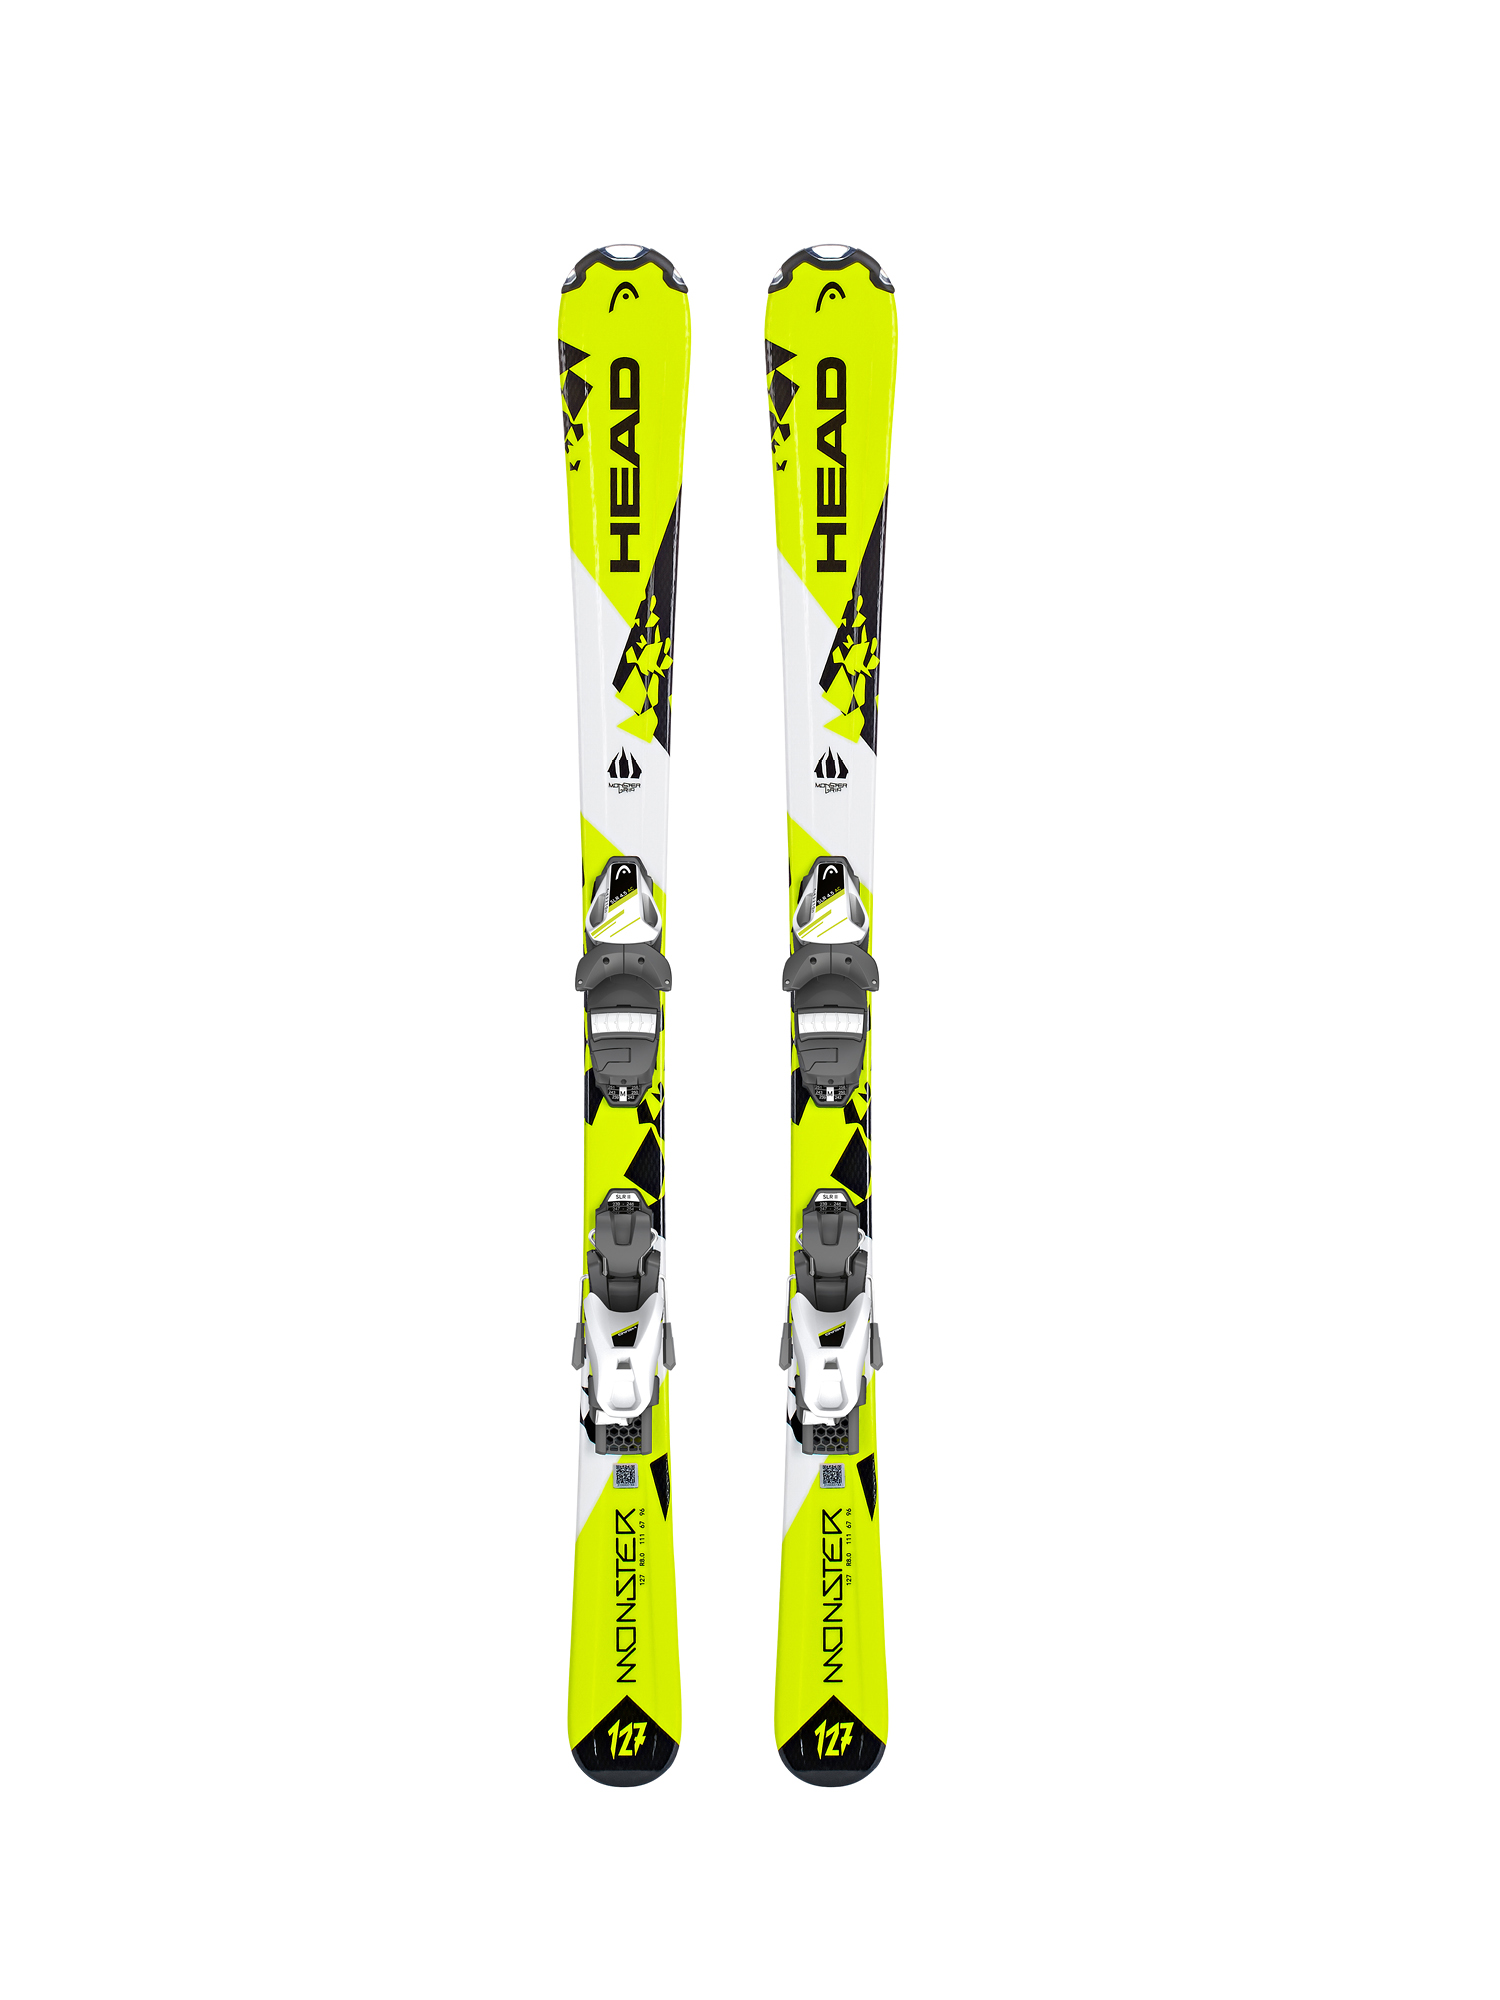 Home   La Plagne   Equipment Hire   La Plagne Rental Shop   Children s Ski  Equipment (3-12) – La Plagne 3ec2f5180